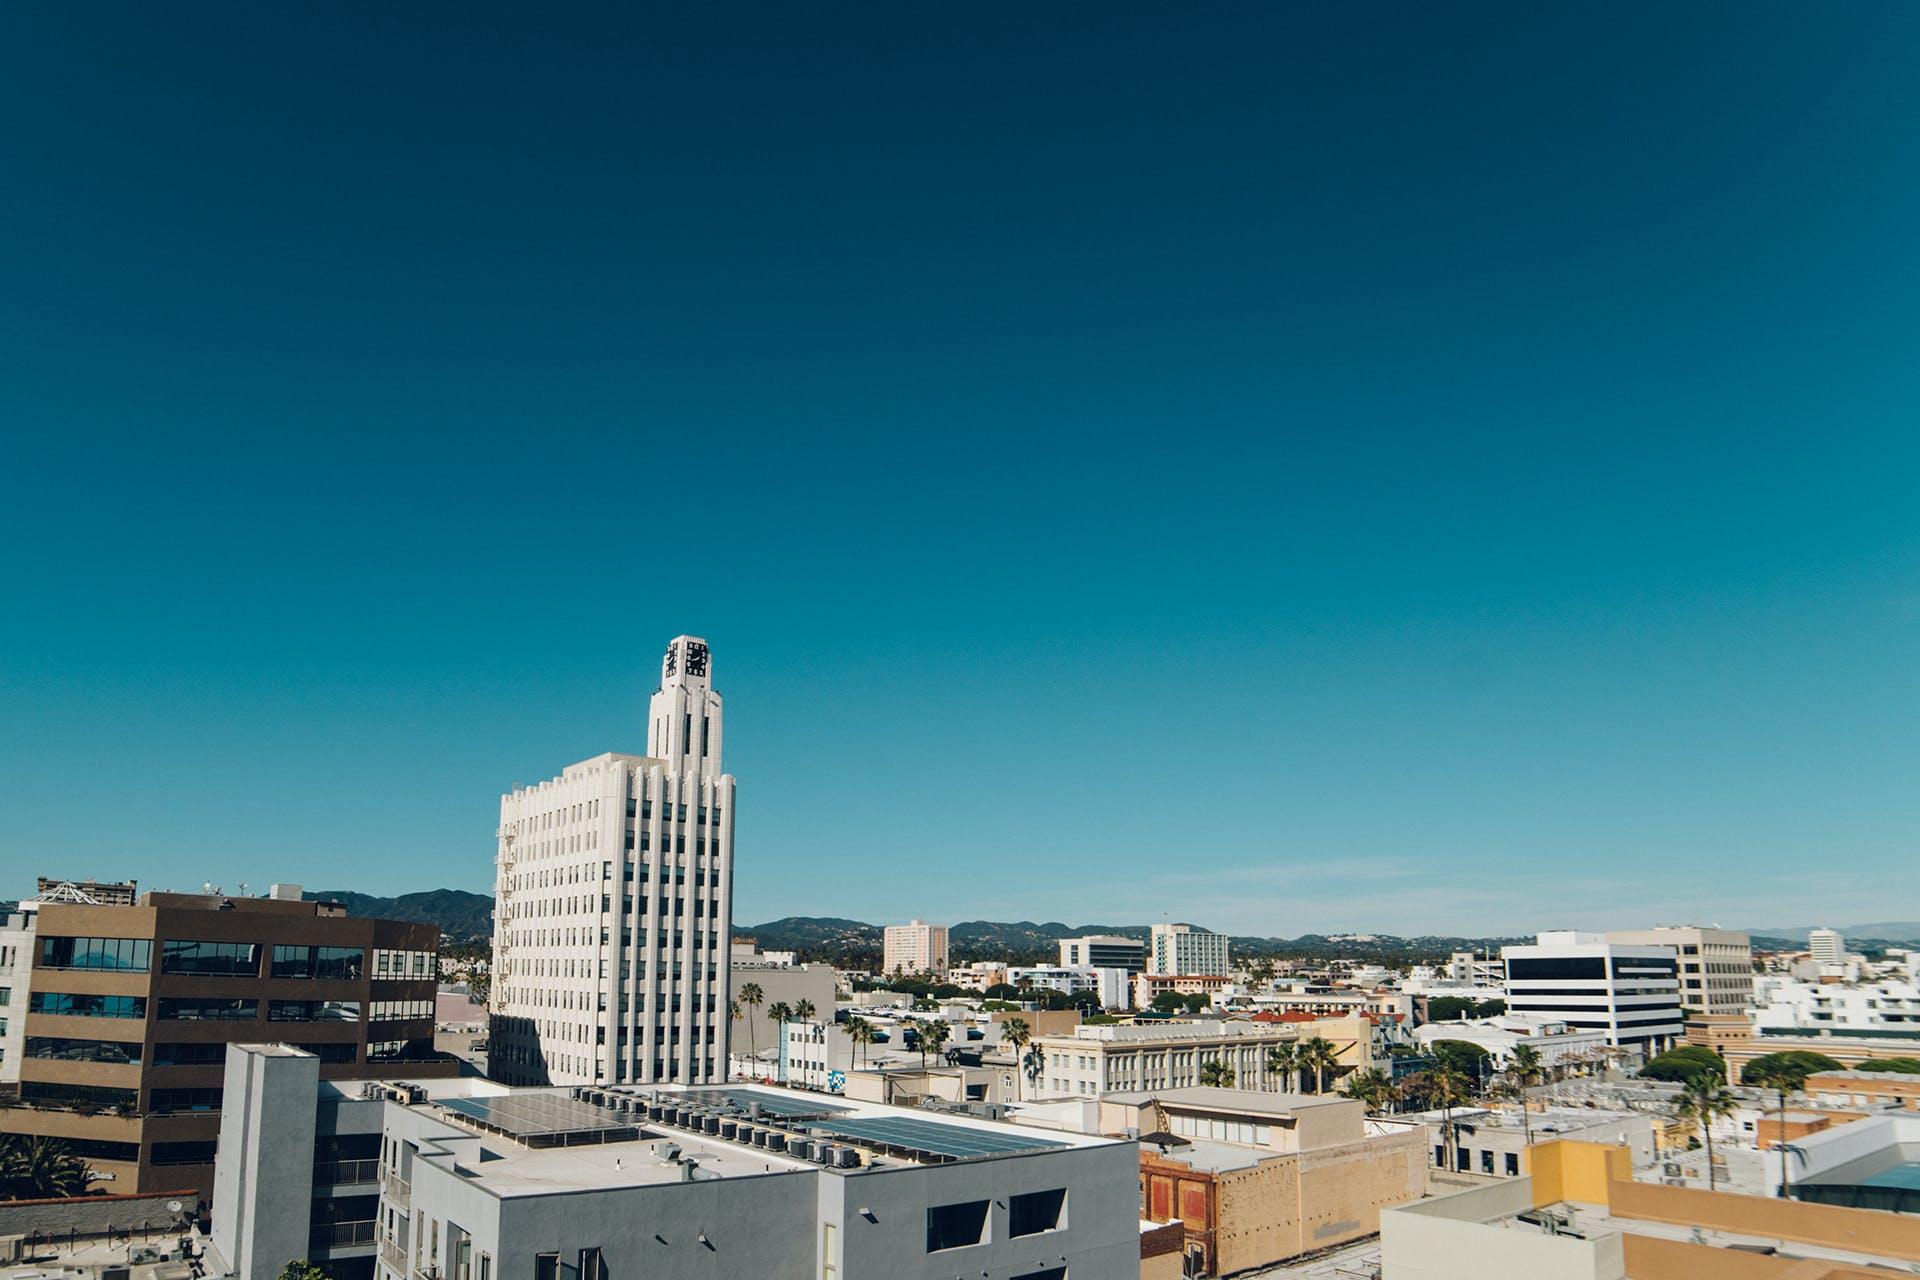 Free stock photo of city, Santa Monica